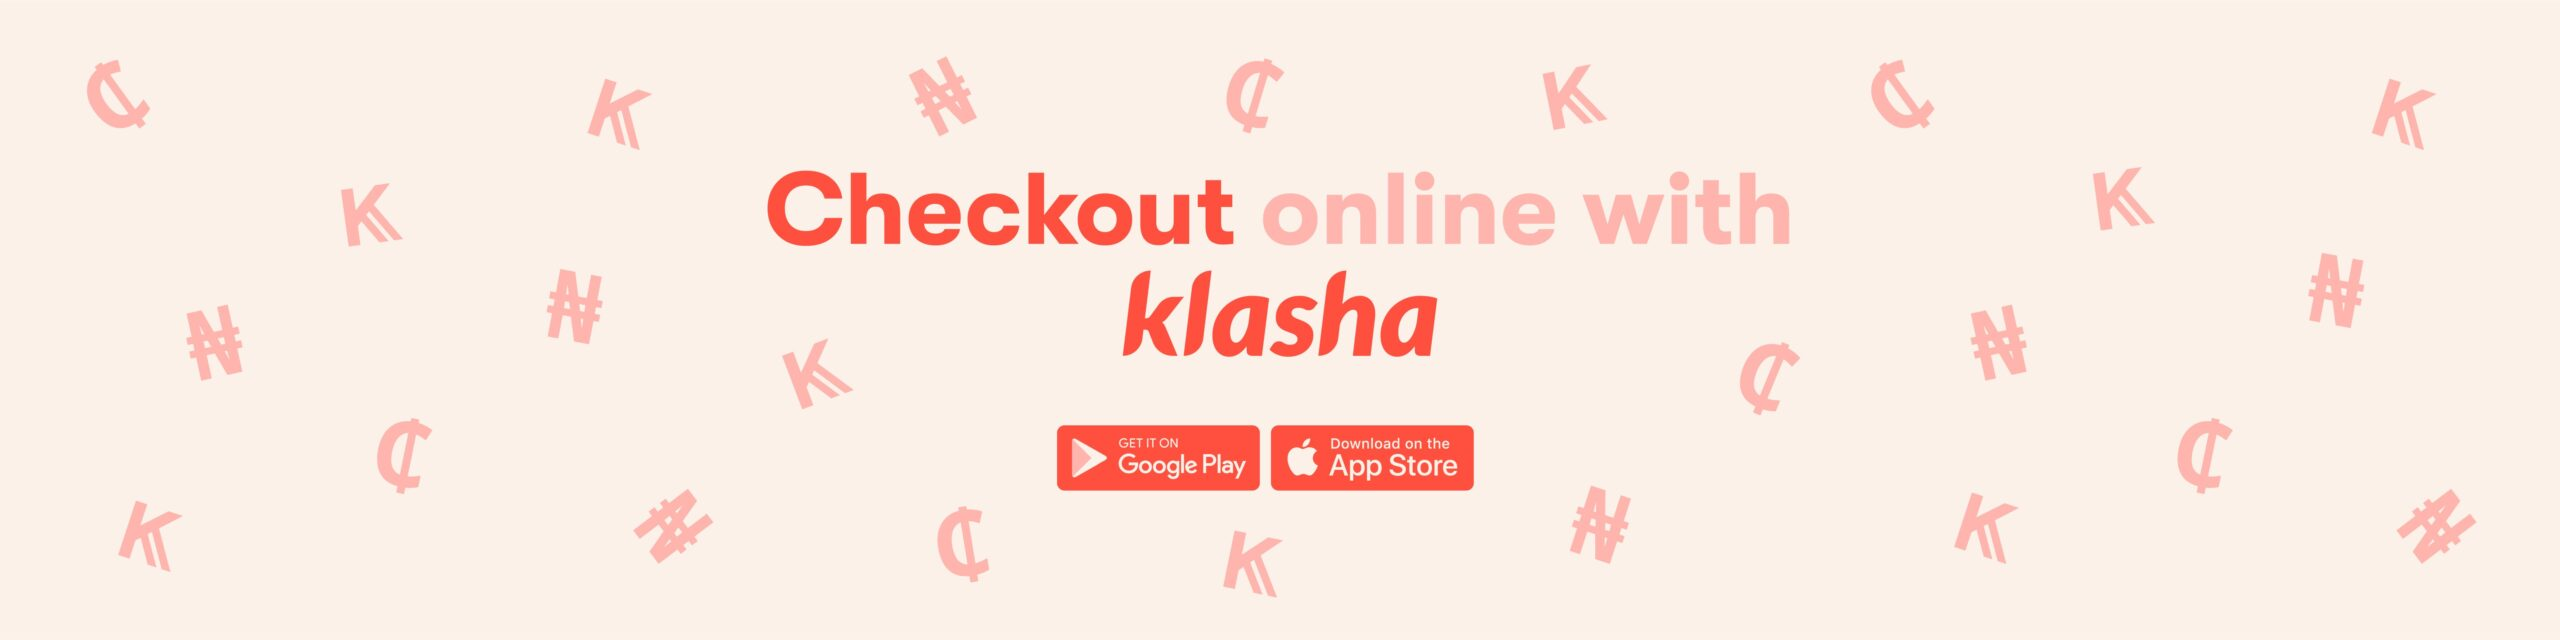 Klasha